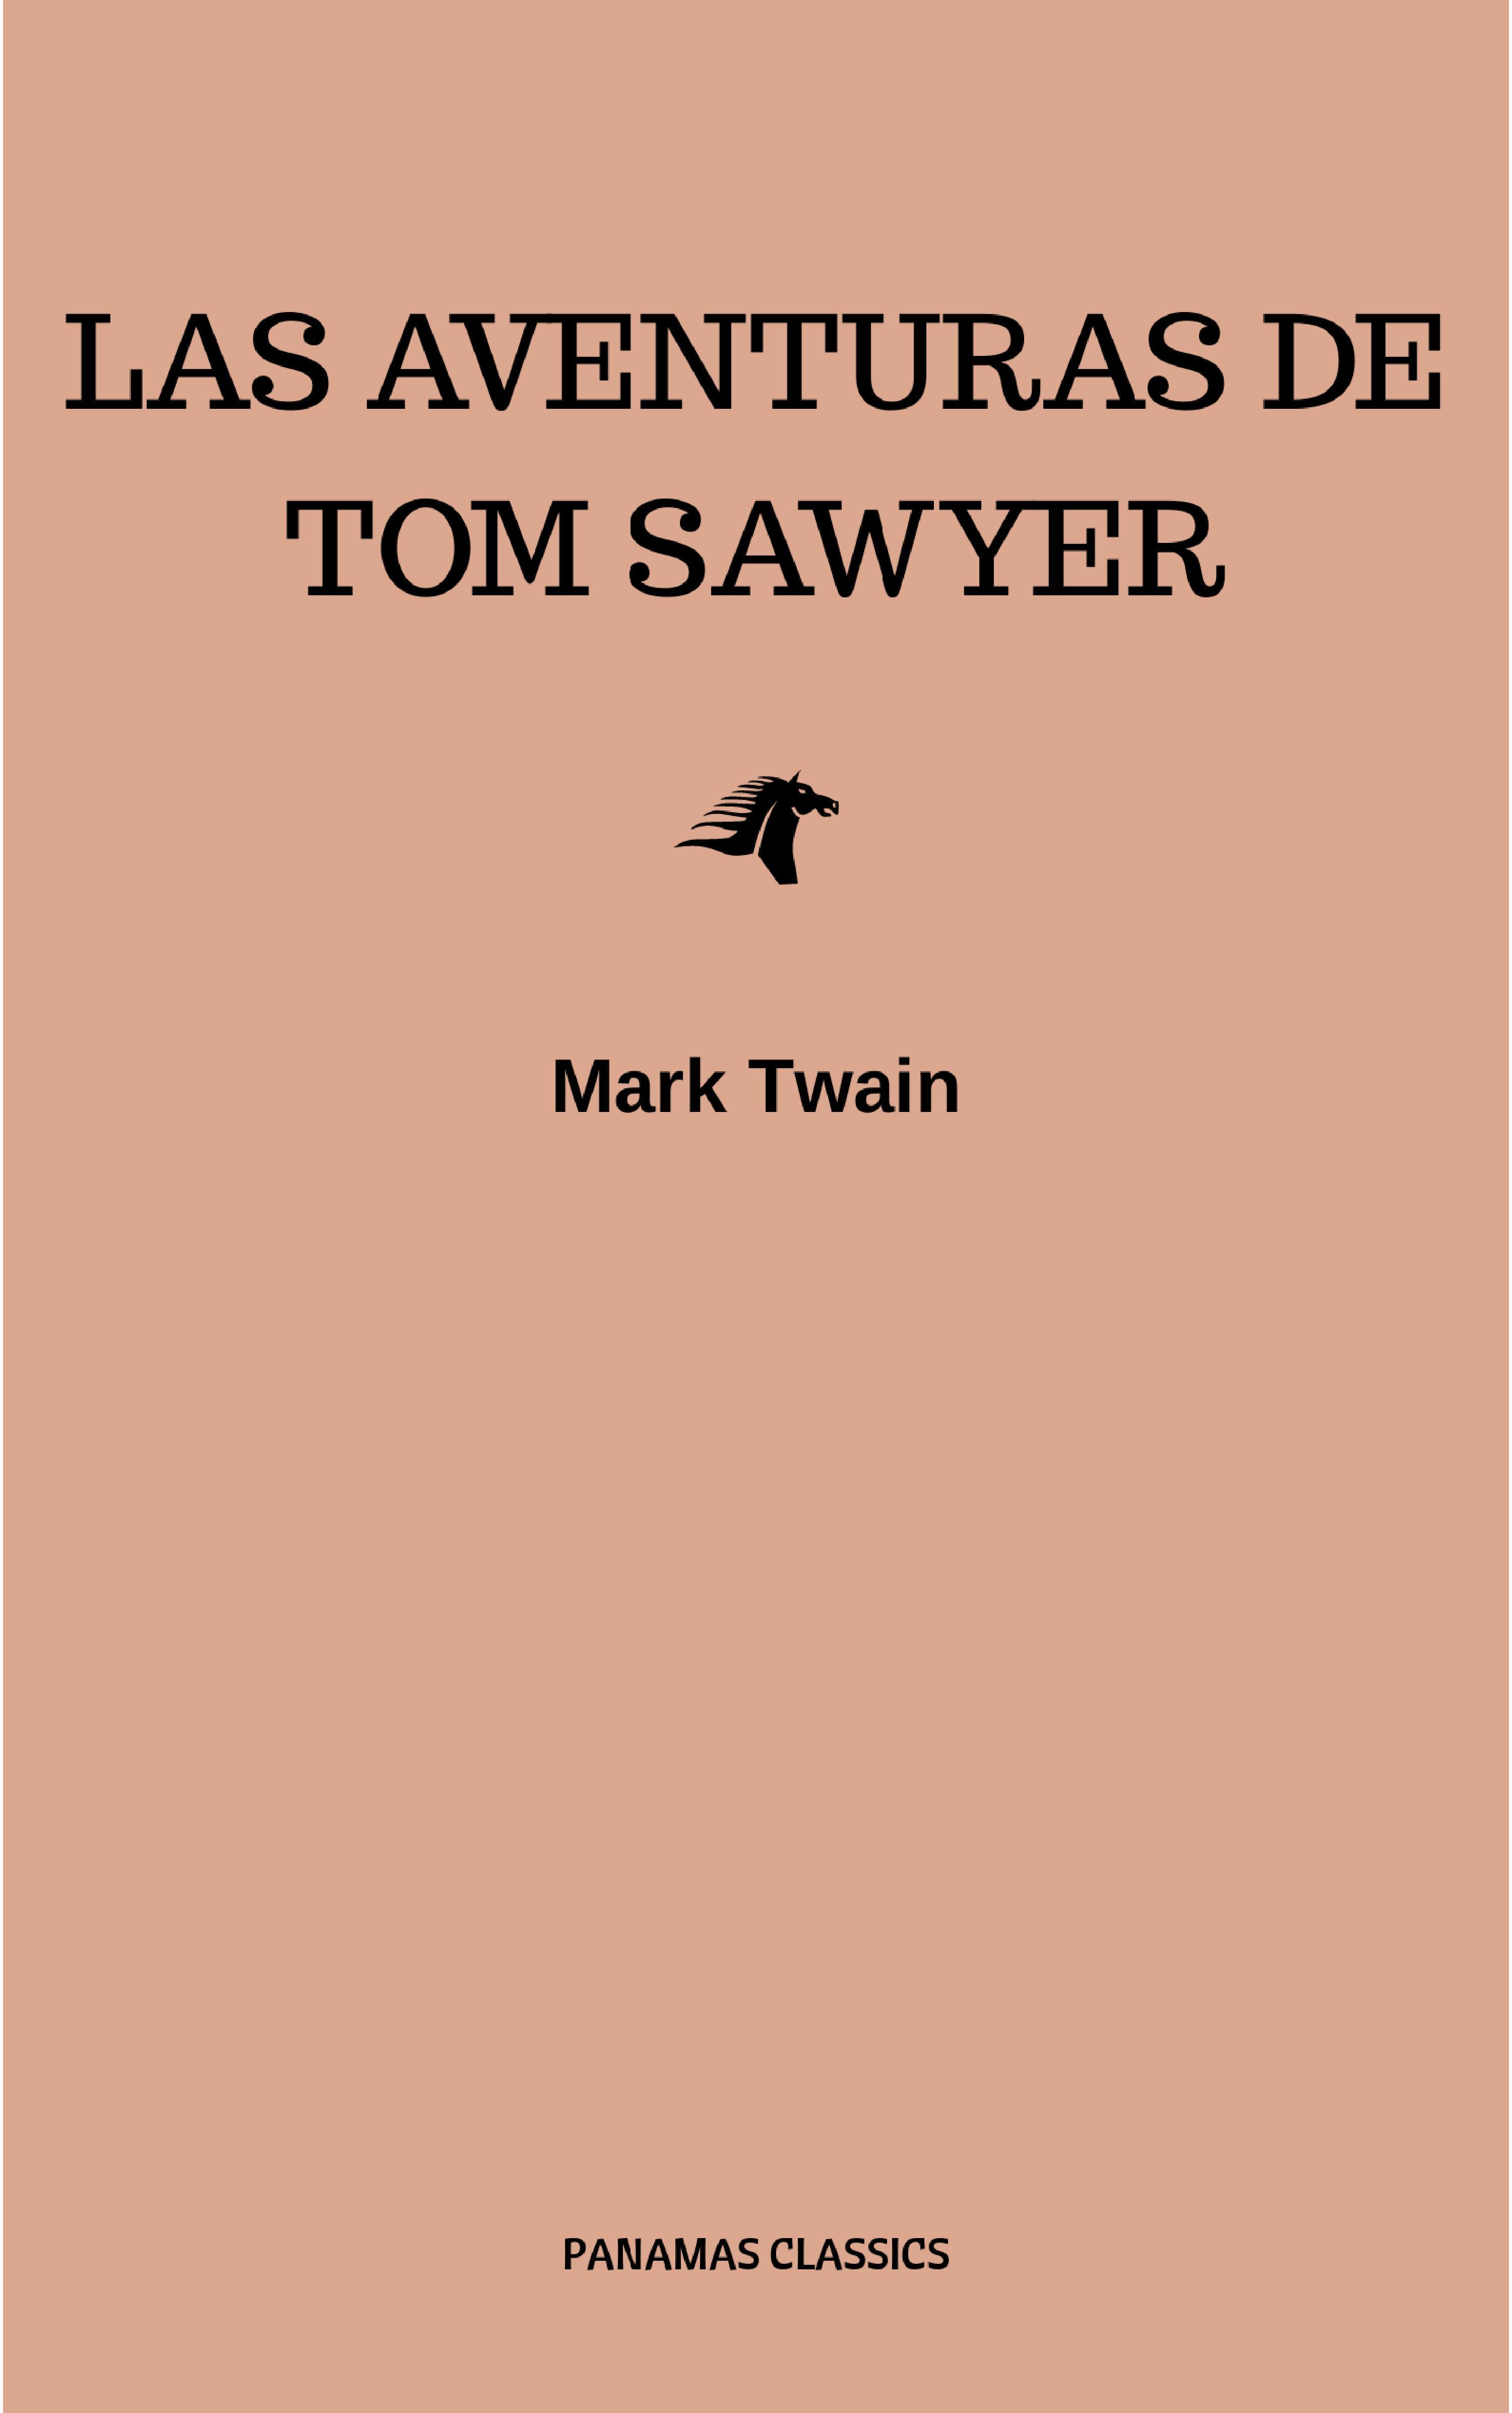 aventuras de masin tom sawyer